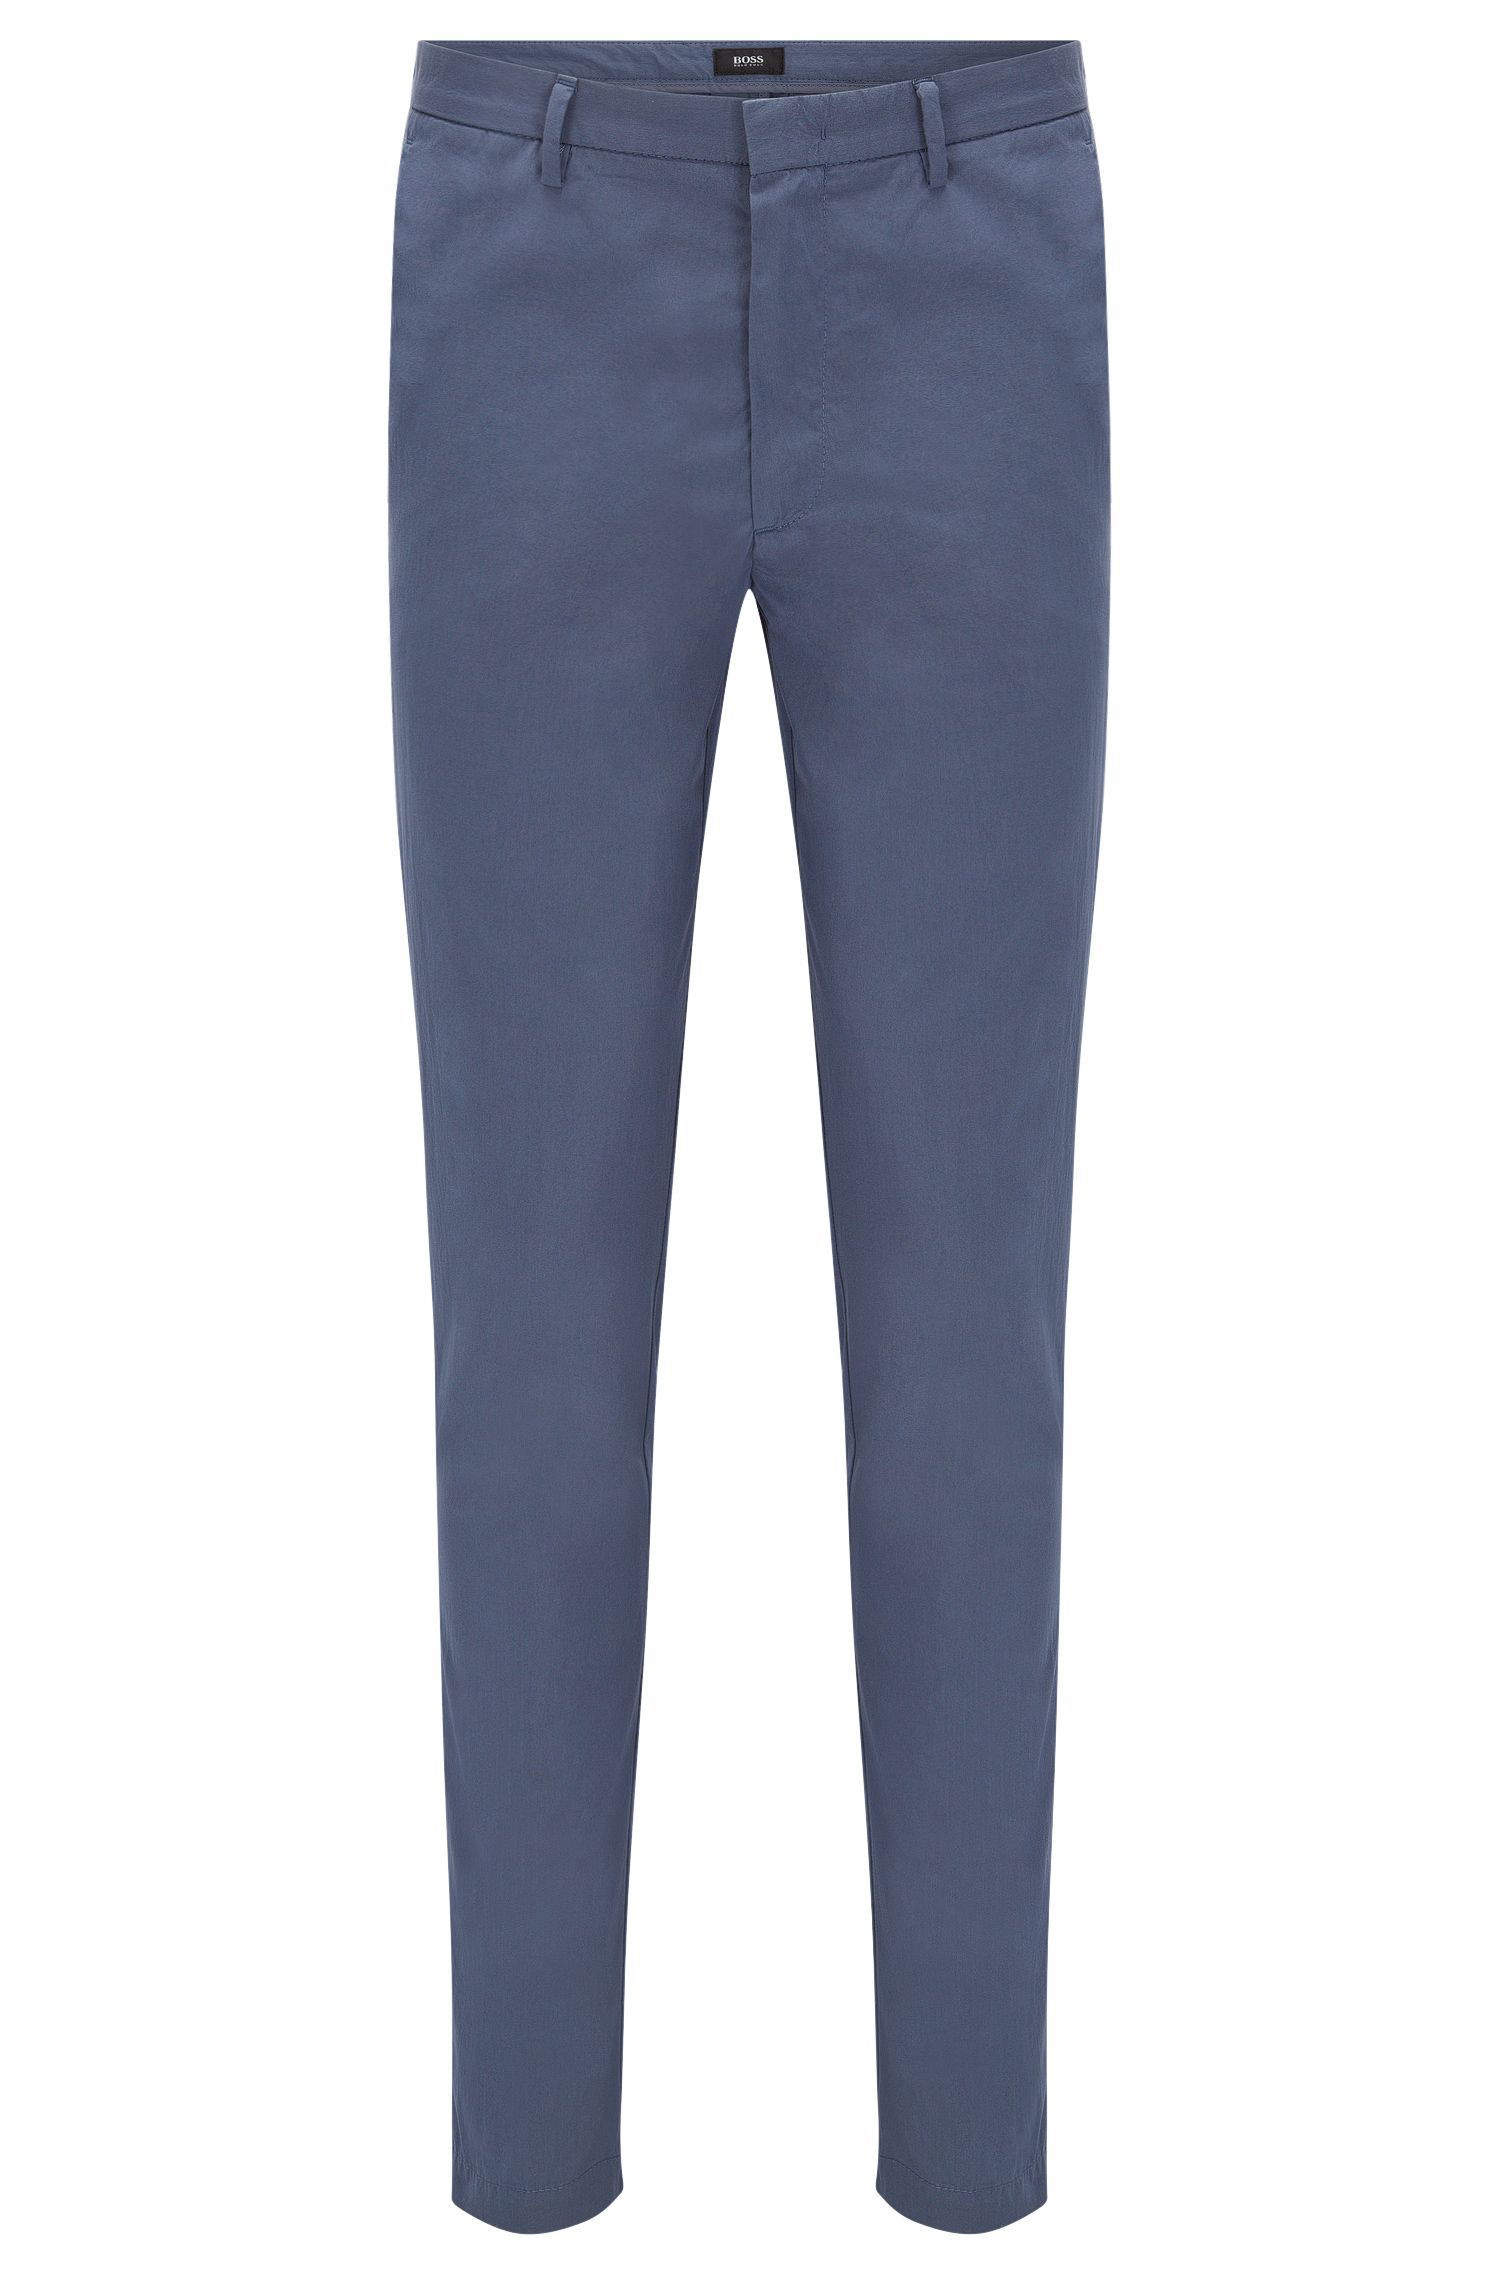 'Kaito W' | Slim Fit, Stretch Cotton Blend Chino Pants